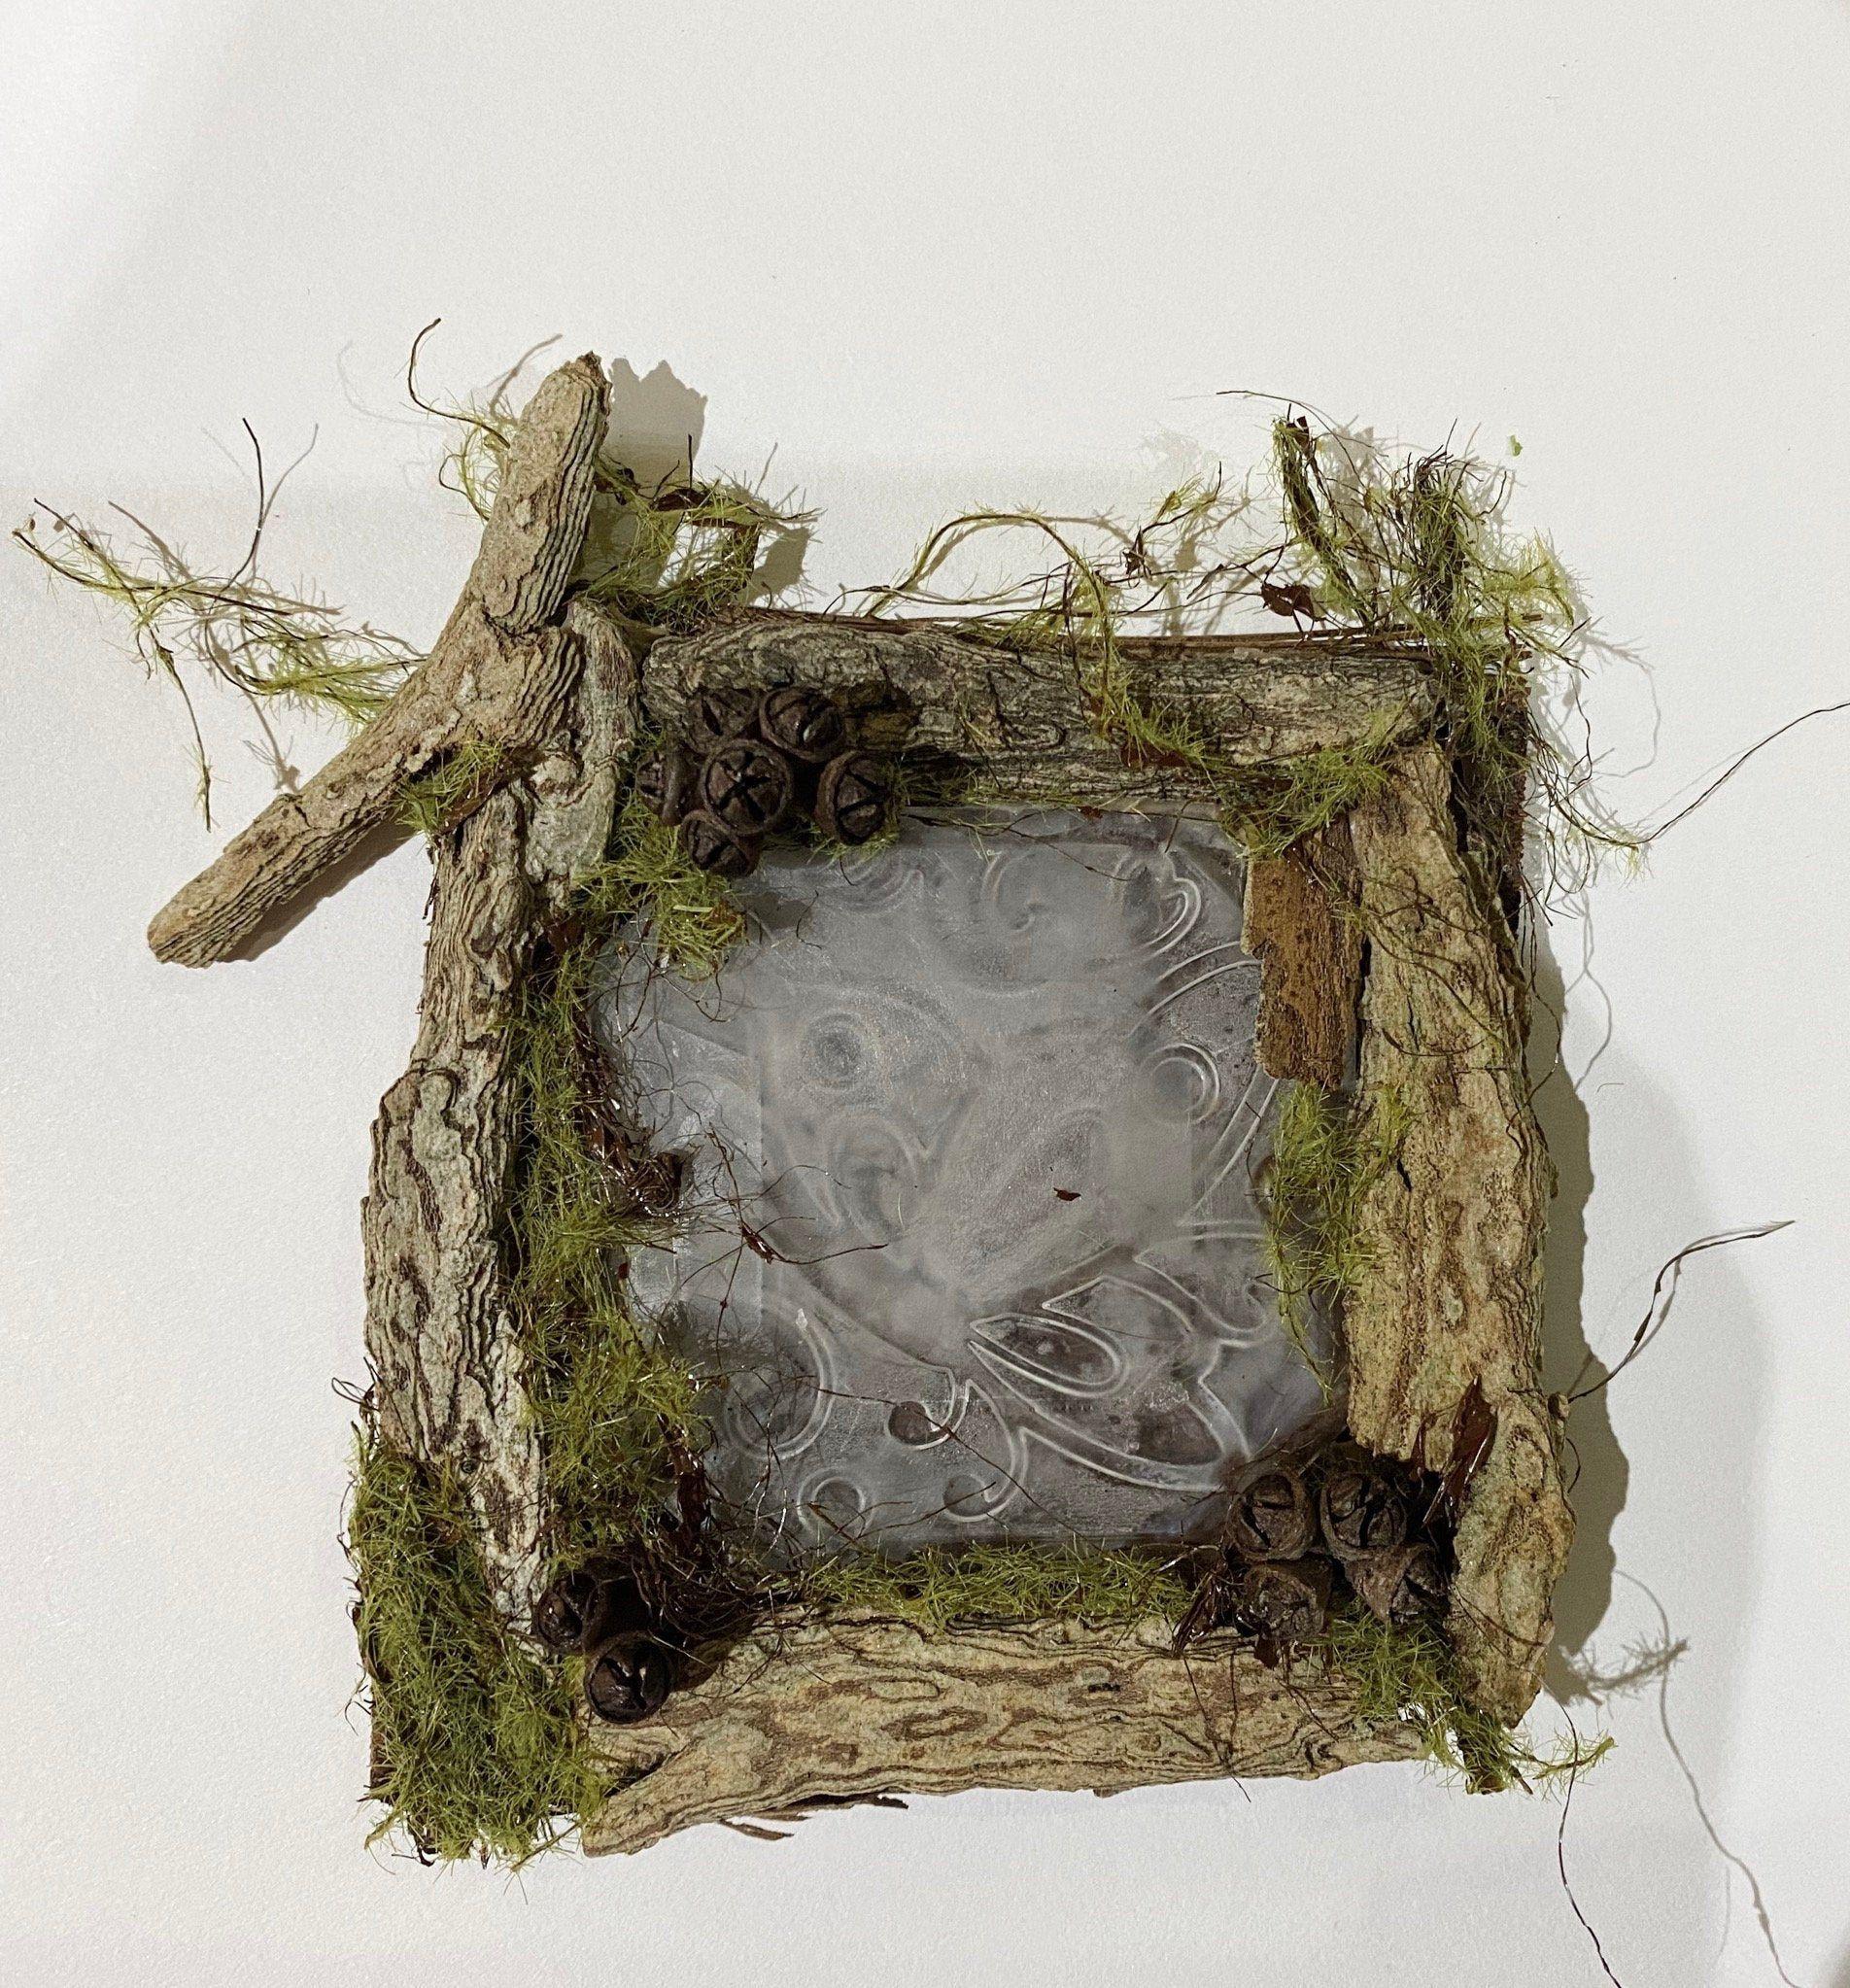 Fairy House Window-Fairy Garden, Miniature, Fairy Furniture, Indoor Garden, Twig furniture